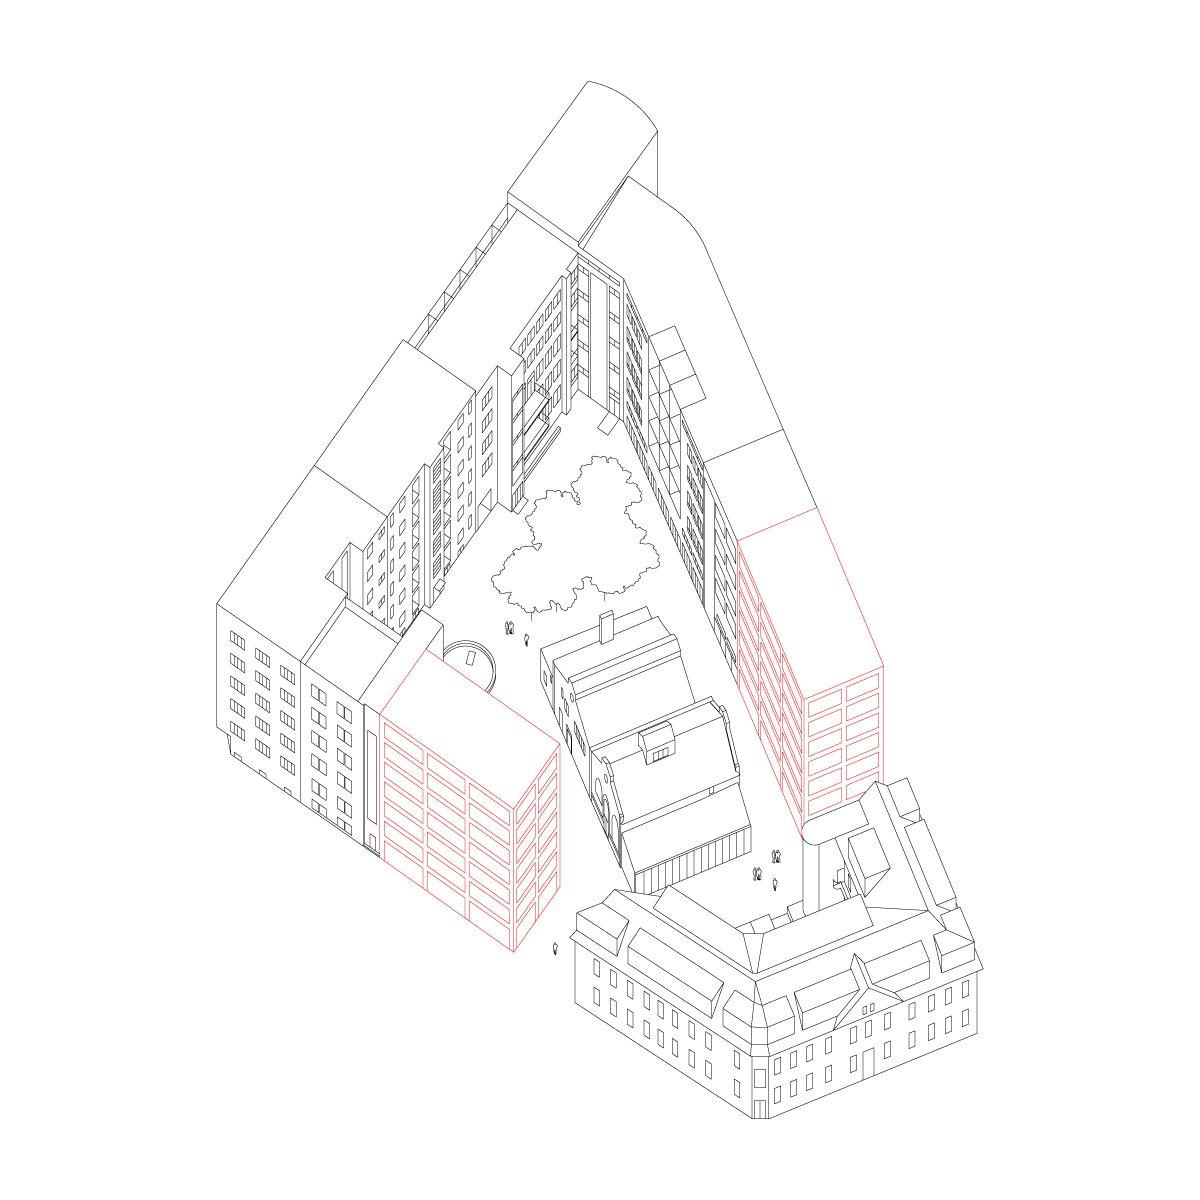 Axonometric View, Architectural Presentation, Landscape Architecture, Architecture  Design, Architectural Drawings, Objects, Architecture, Architecture ...